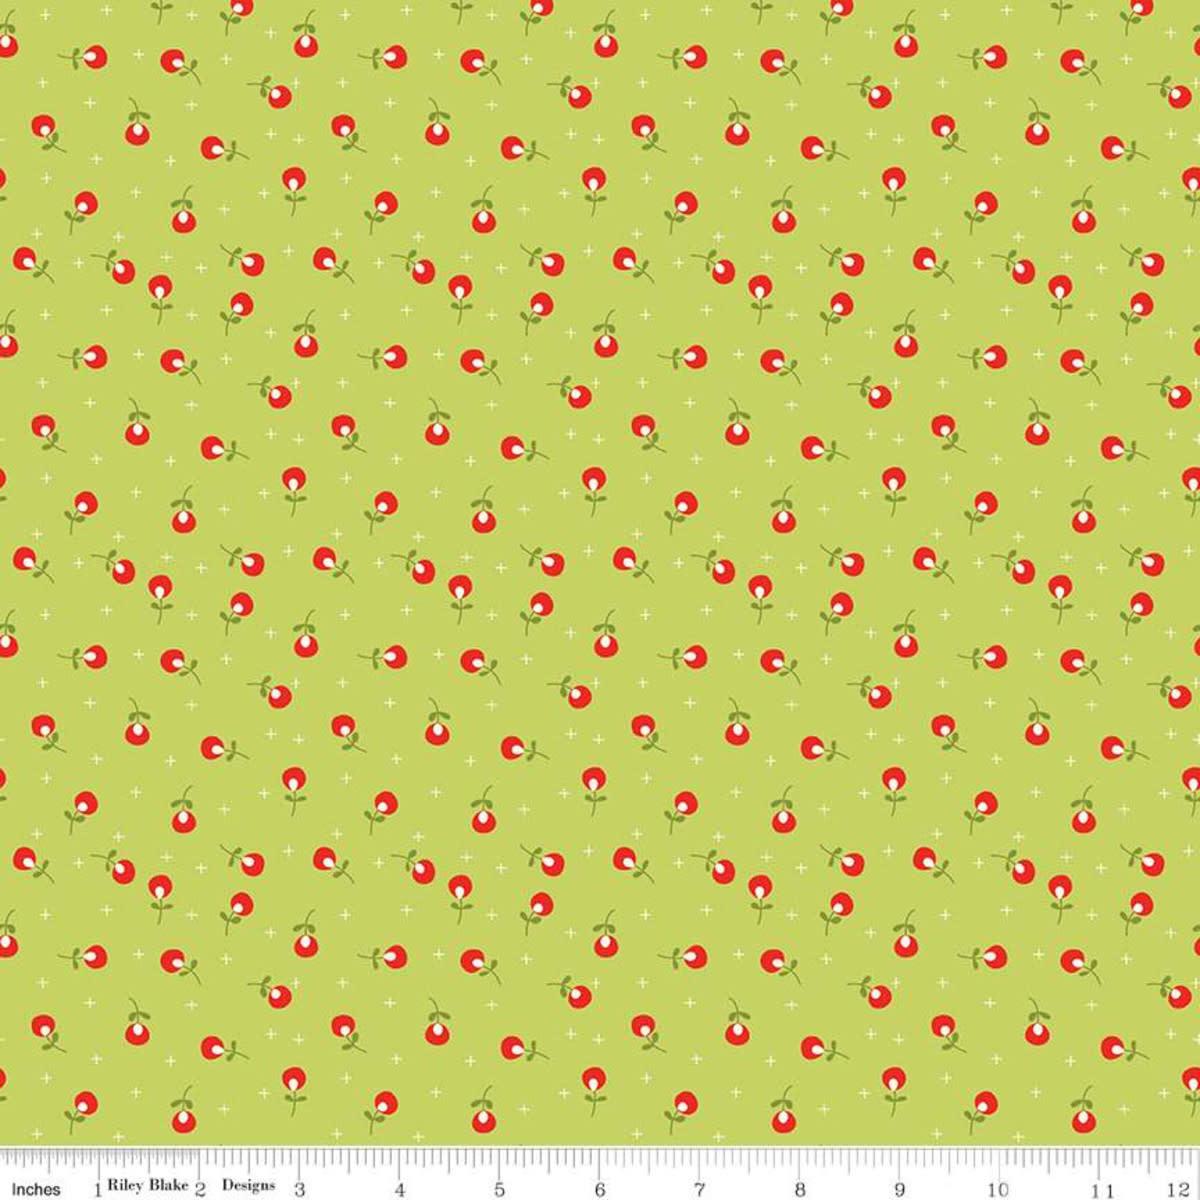 RILEY BLAKE DESIGNS MERRY LITTLE CHRISTMAS, BERRIES, GREEN $0.20 /CM OR $20/M